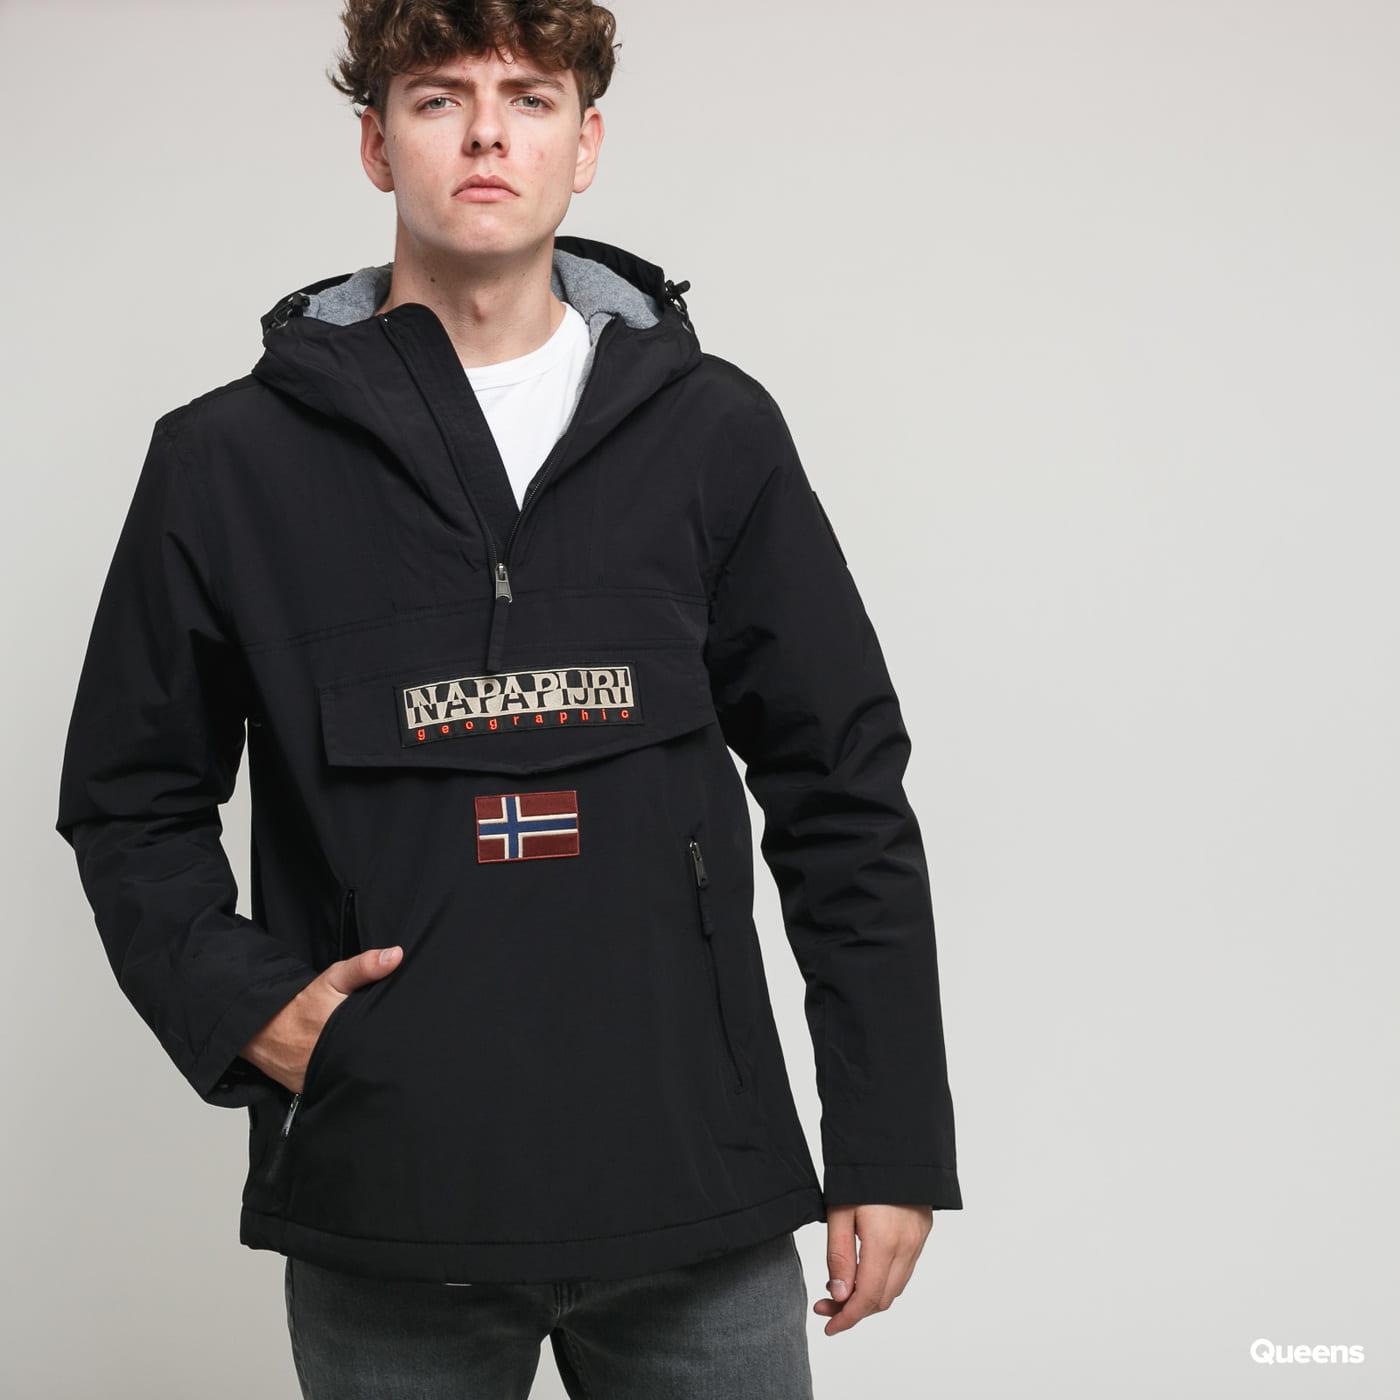 Napapijri Mens Rainforest Pocket Jacket